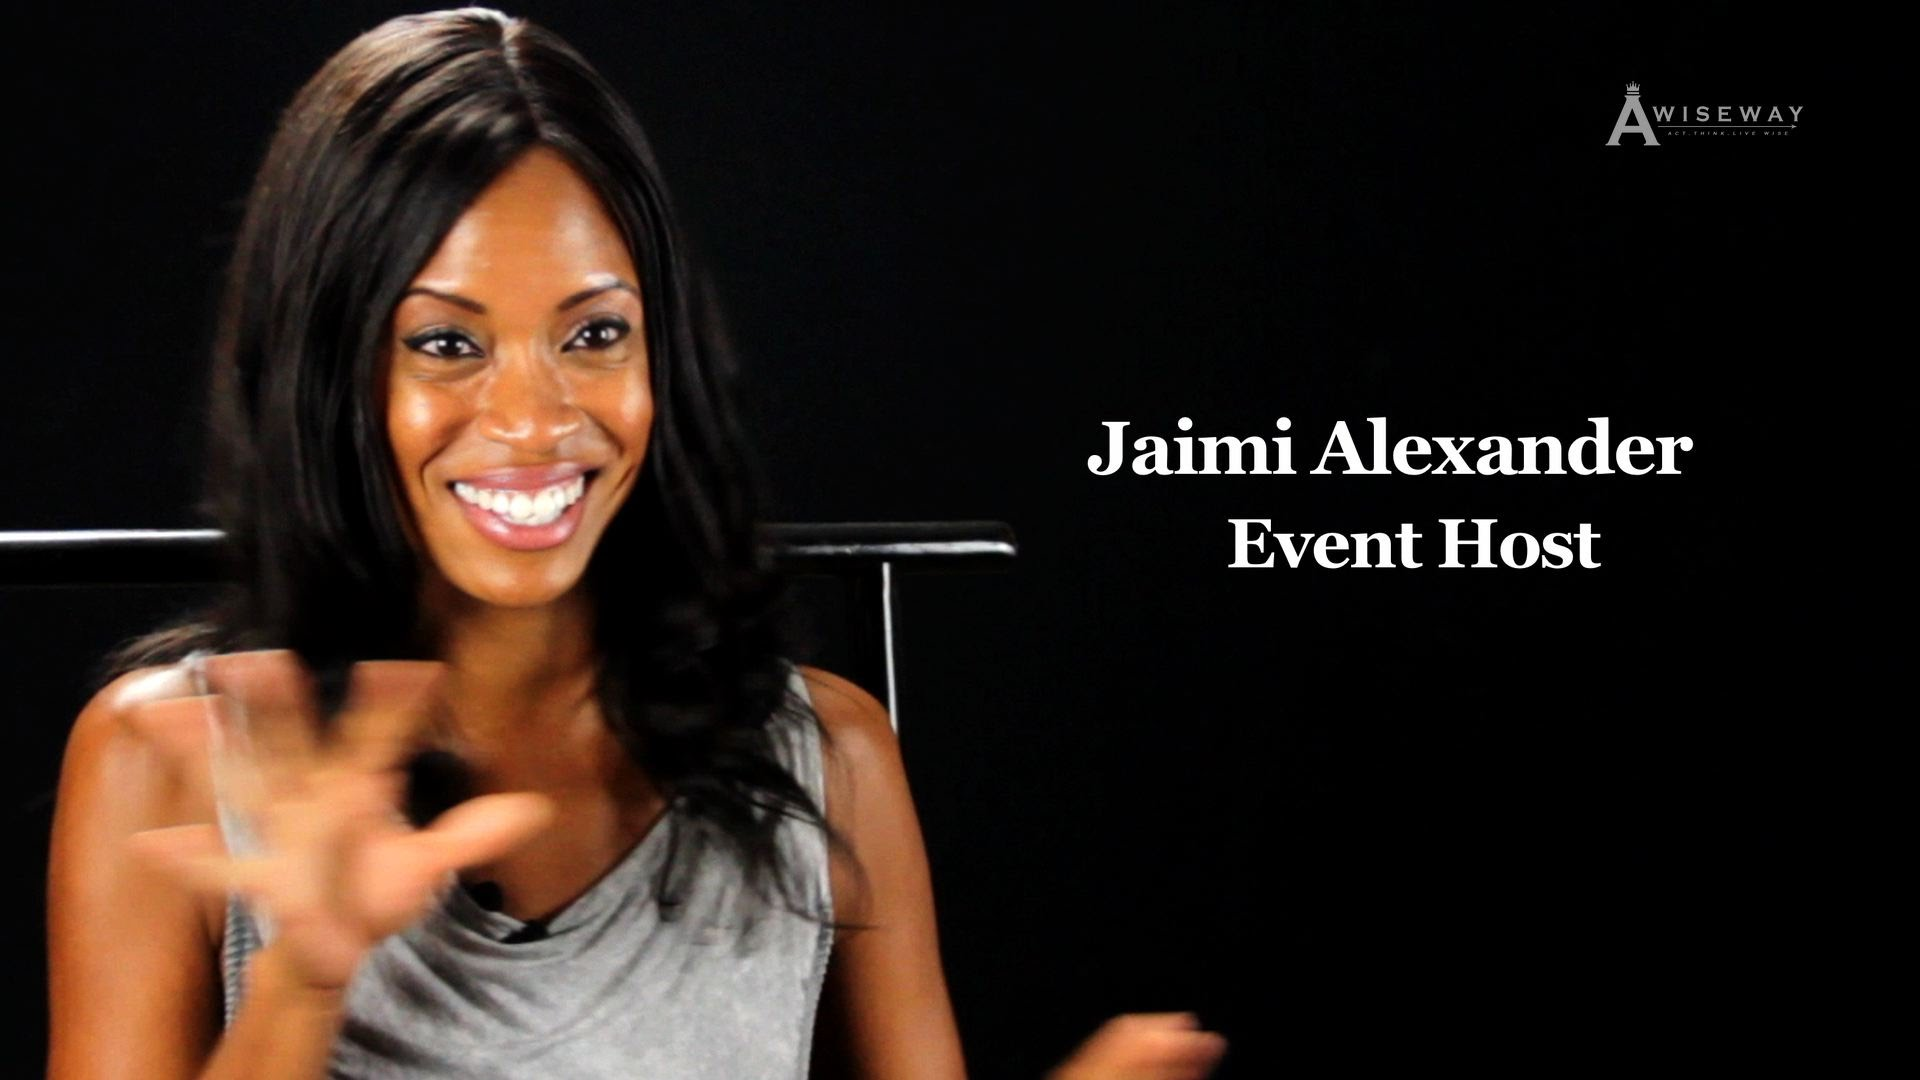 Event Host Give 3 Tips for Better Communication